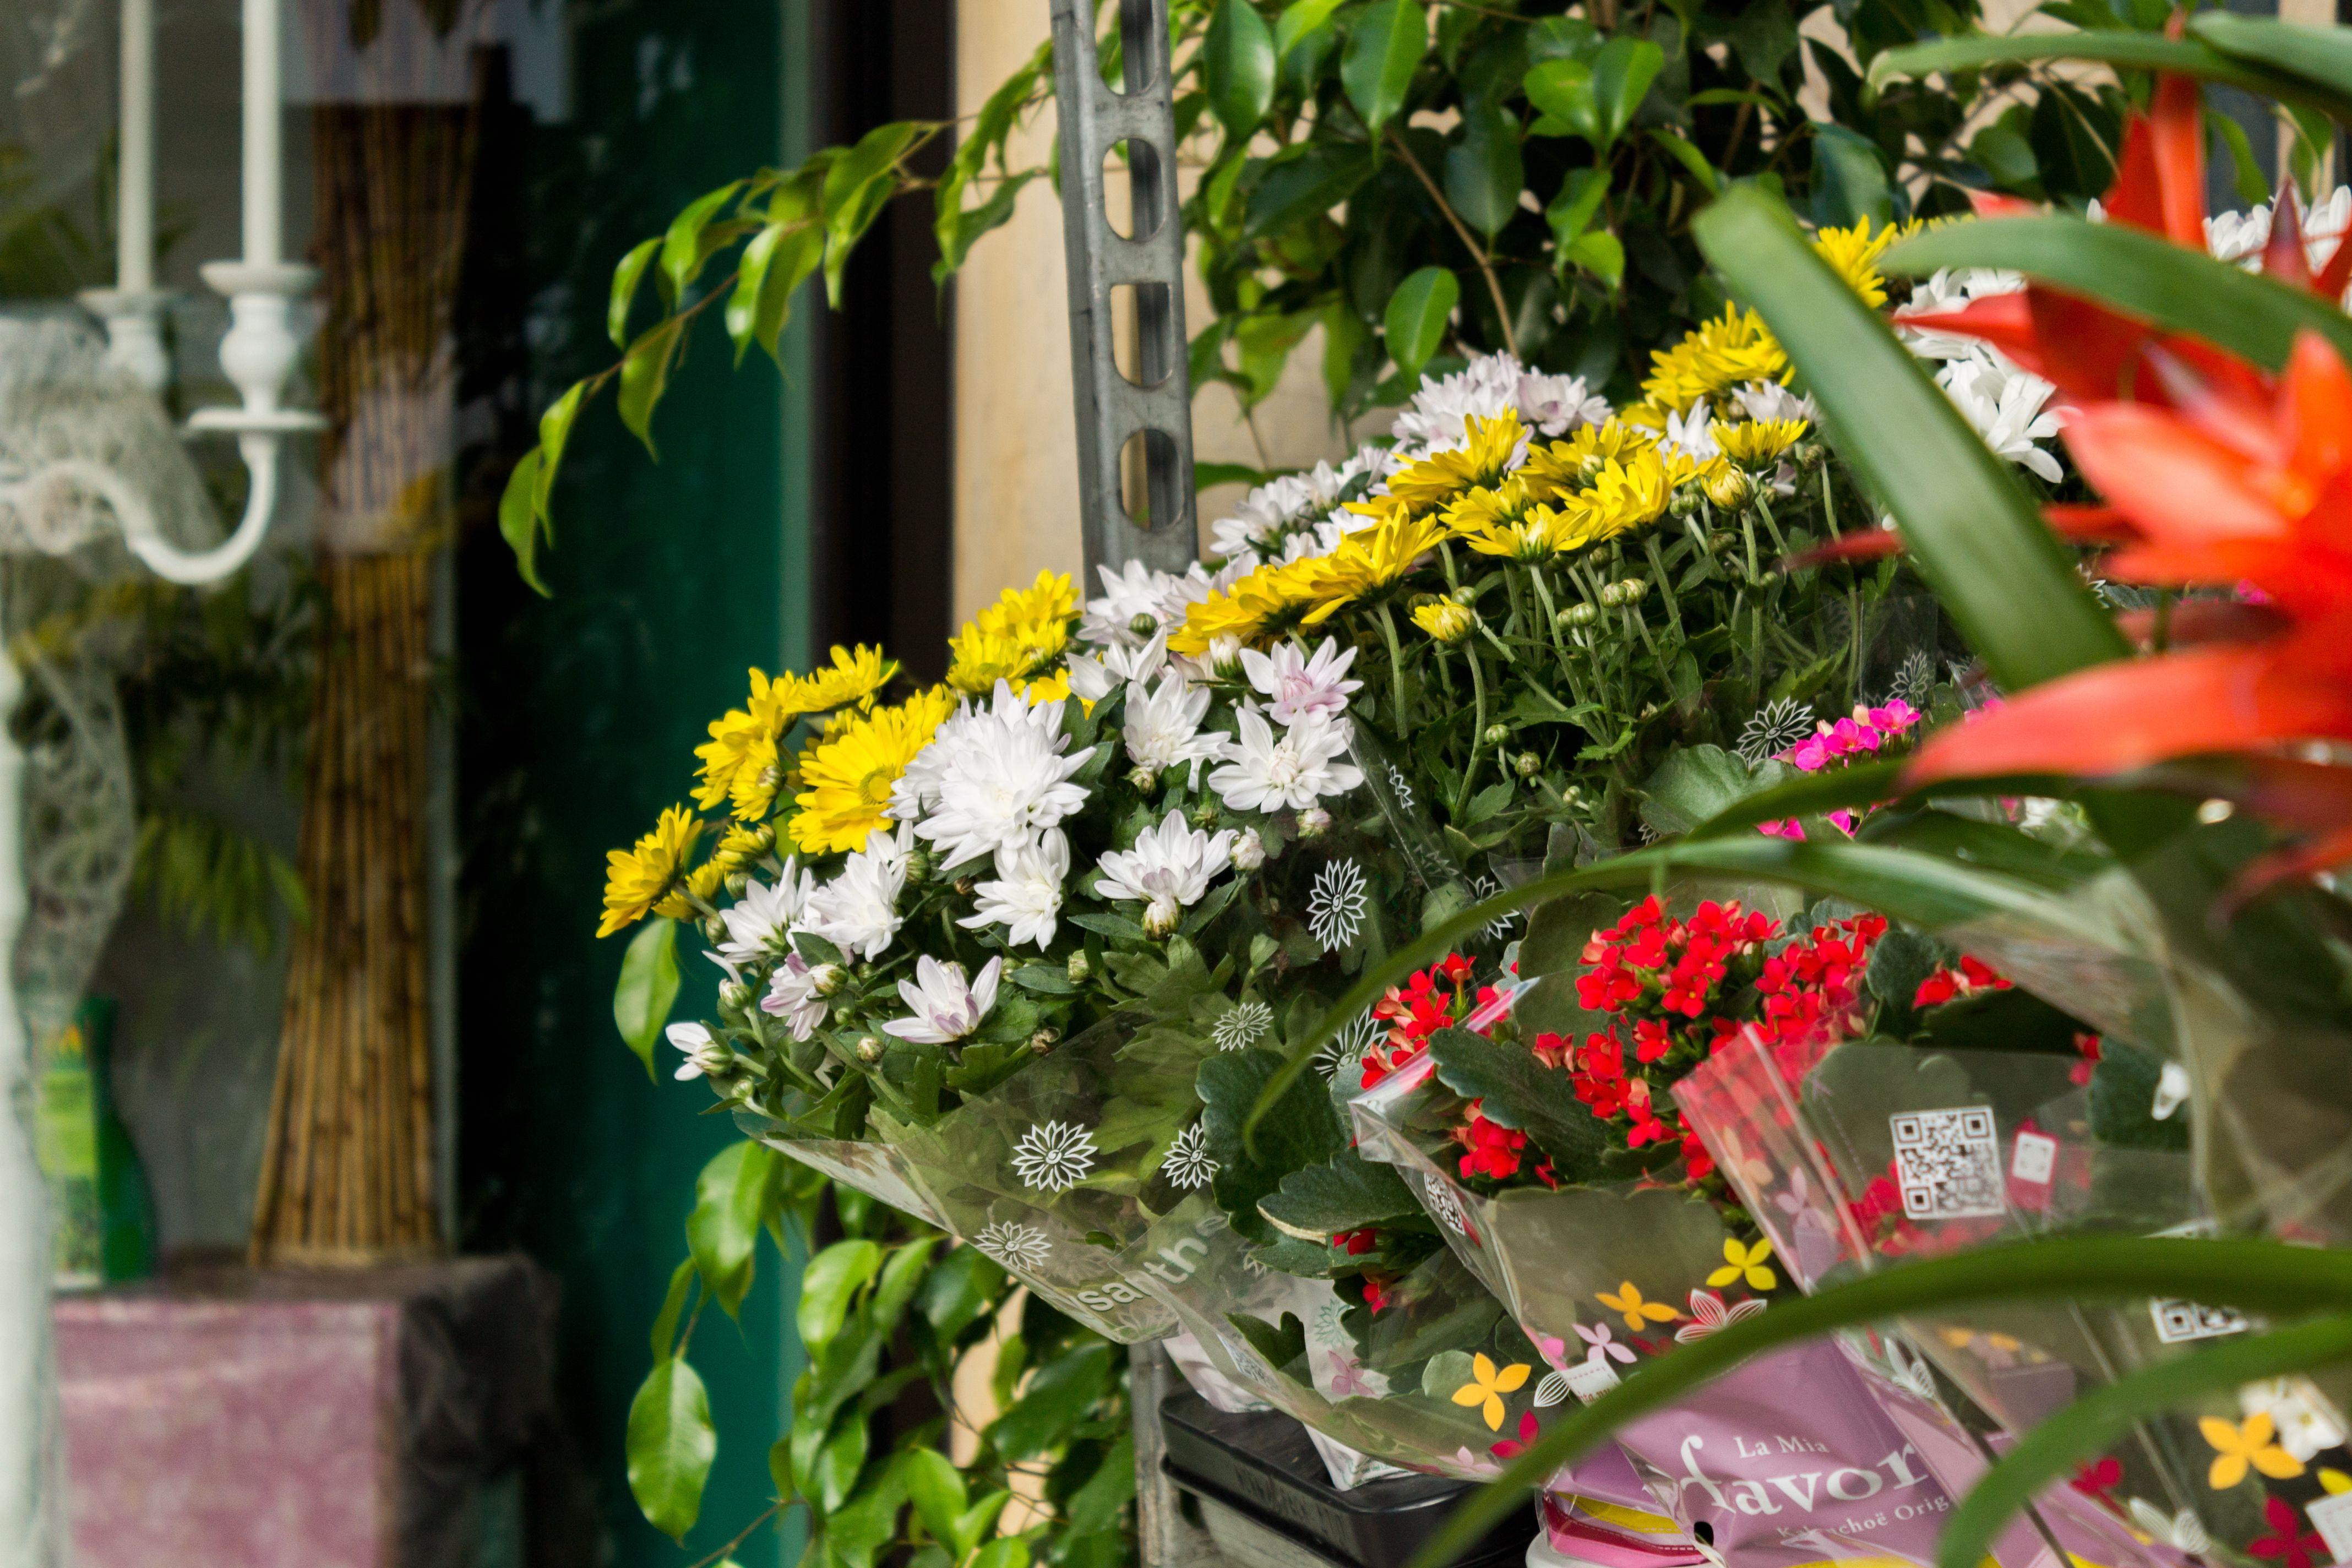 Foto 1 de Floristerías en Málaga   Floristería Miguel